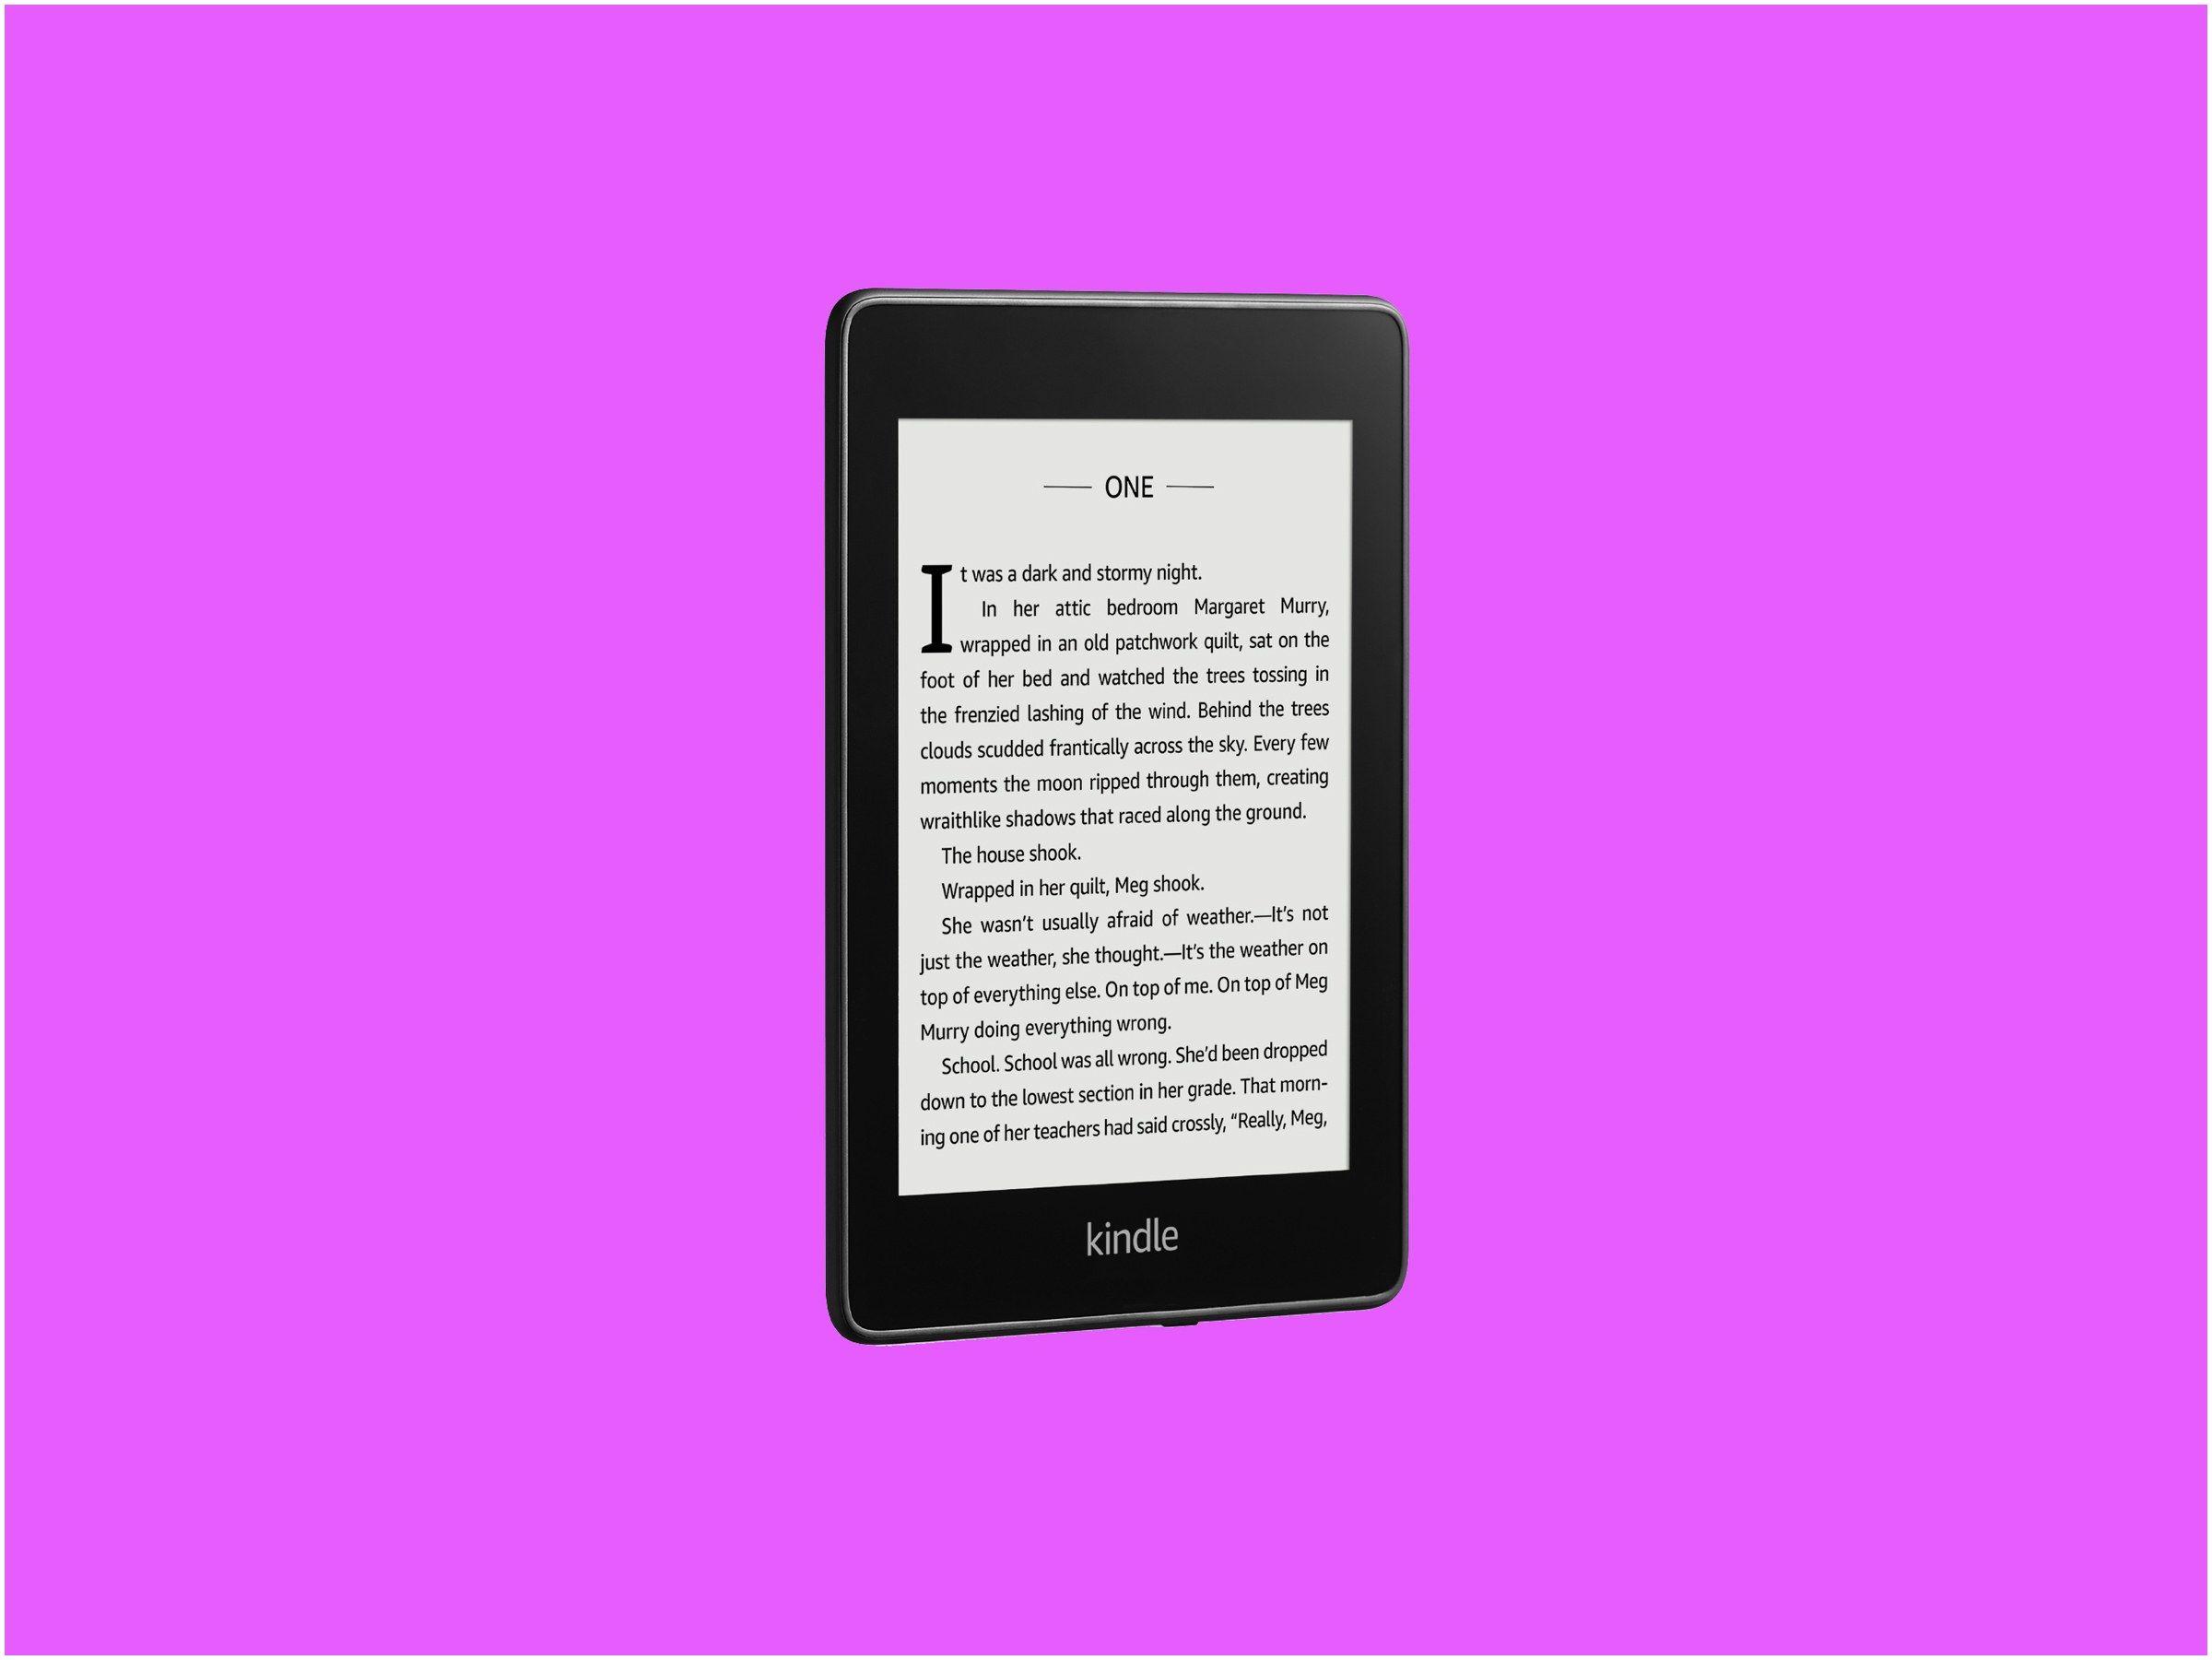 Amazon Kindle Magazines Amazon Prime Day 2019 the Best Kindle is Ly $60